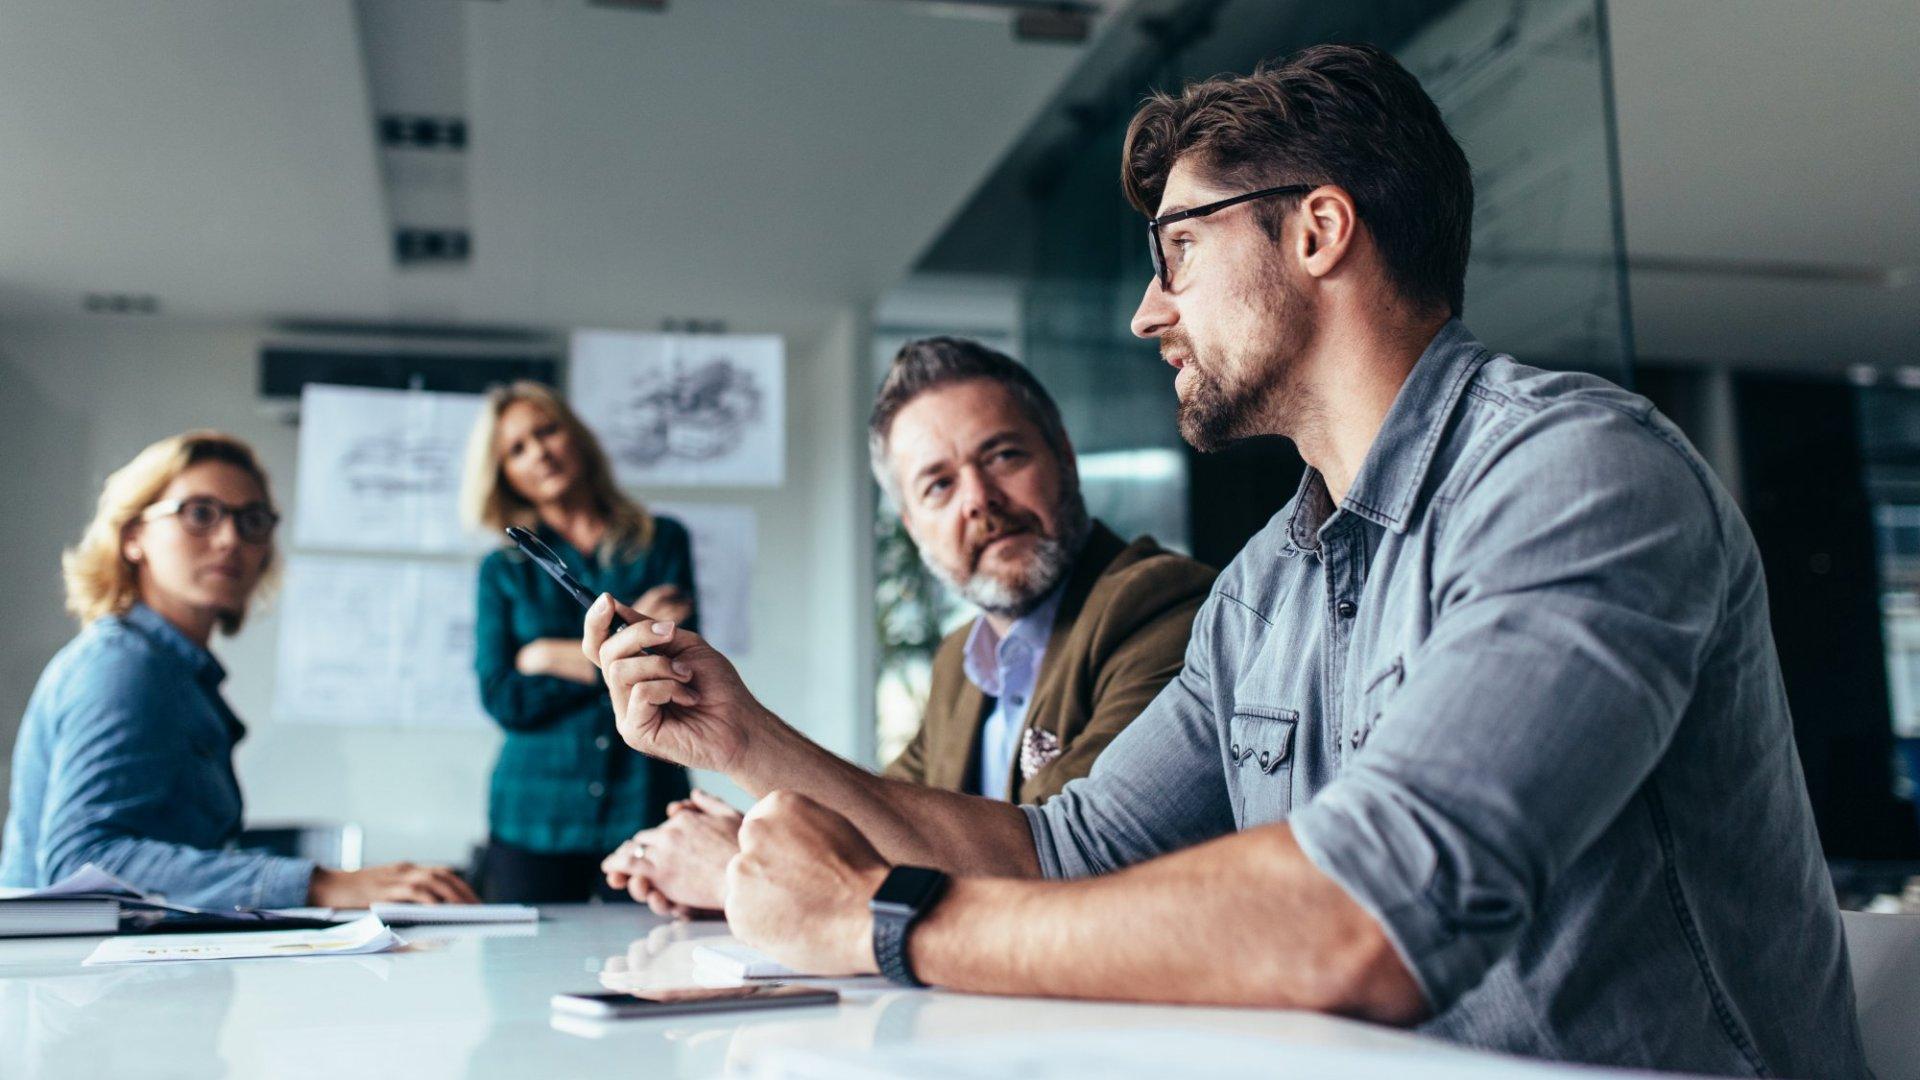 3 Ways to Bridge the Gap Between Your IT and Finance Teams